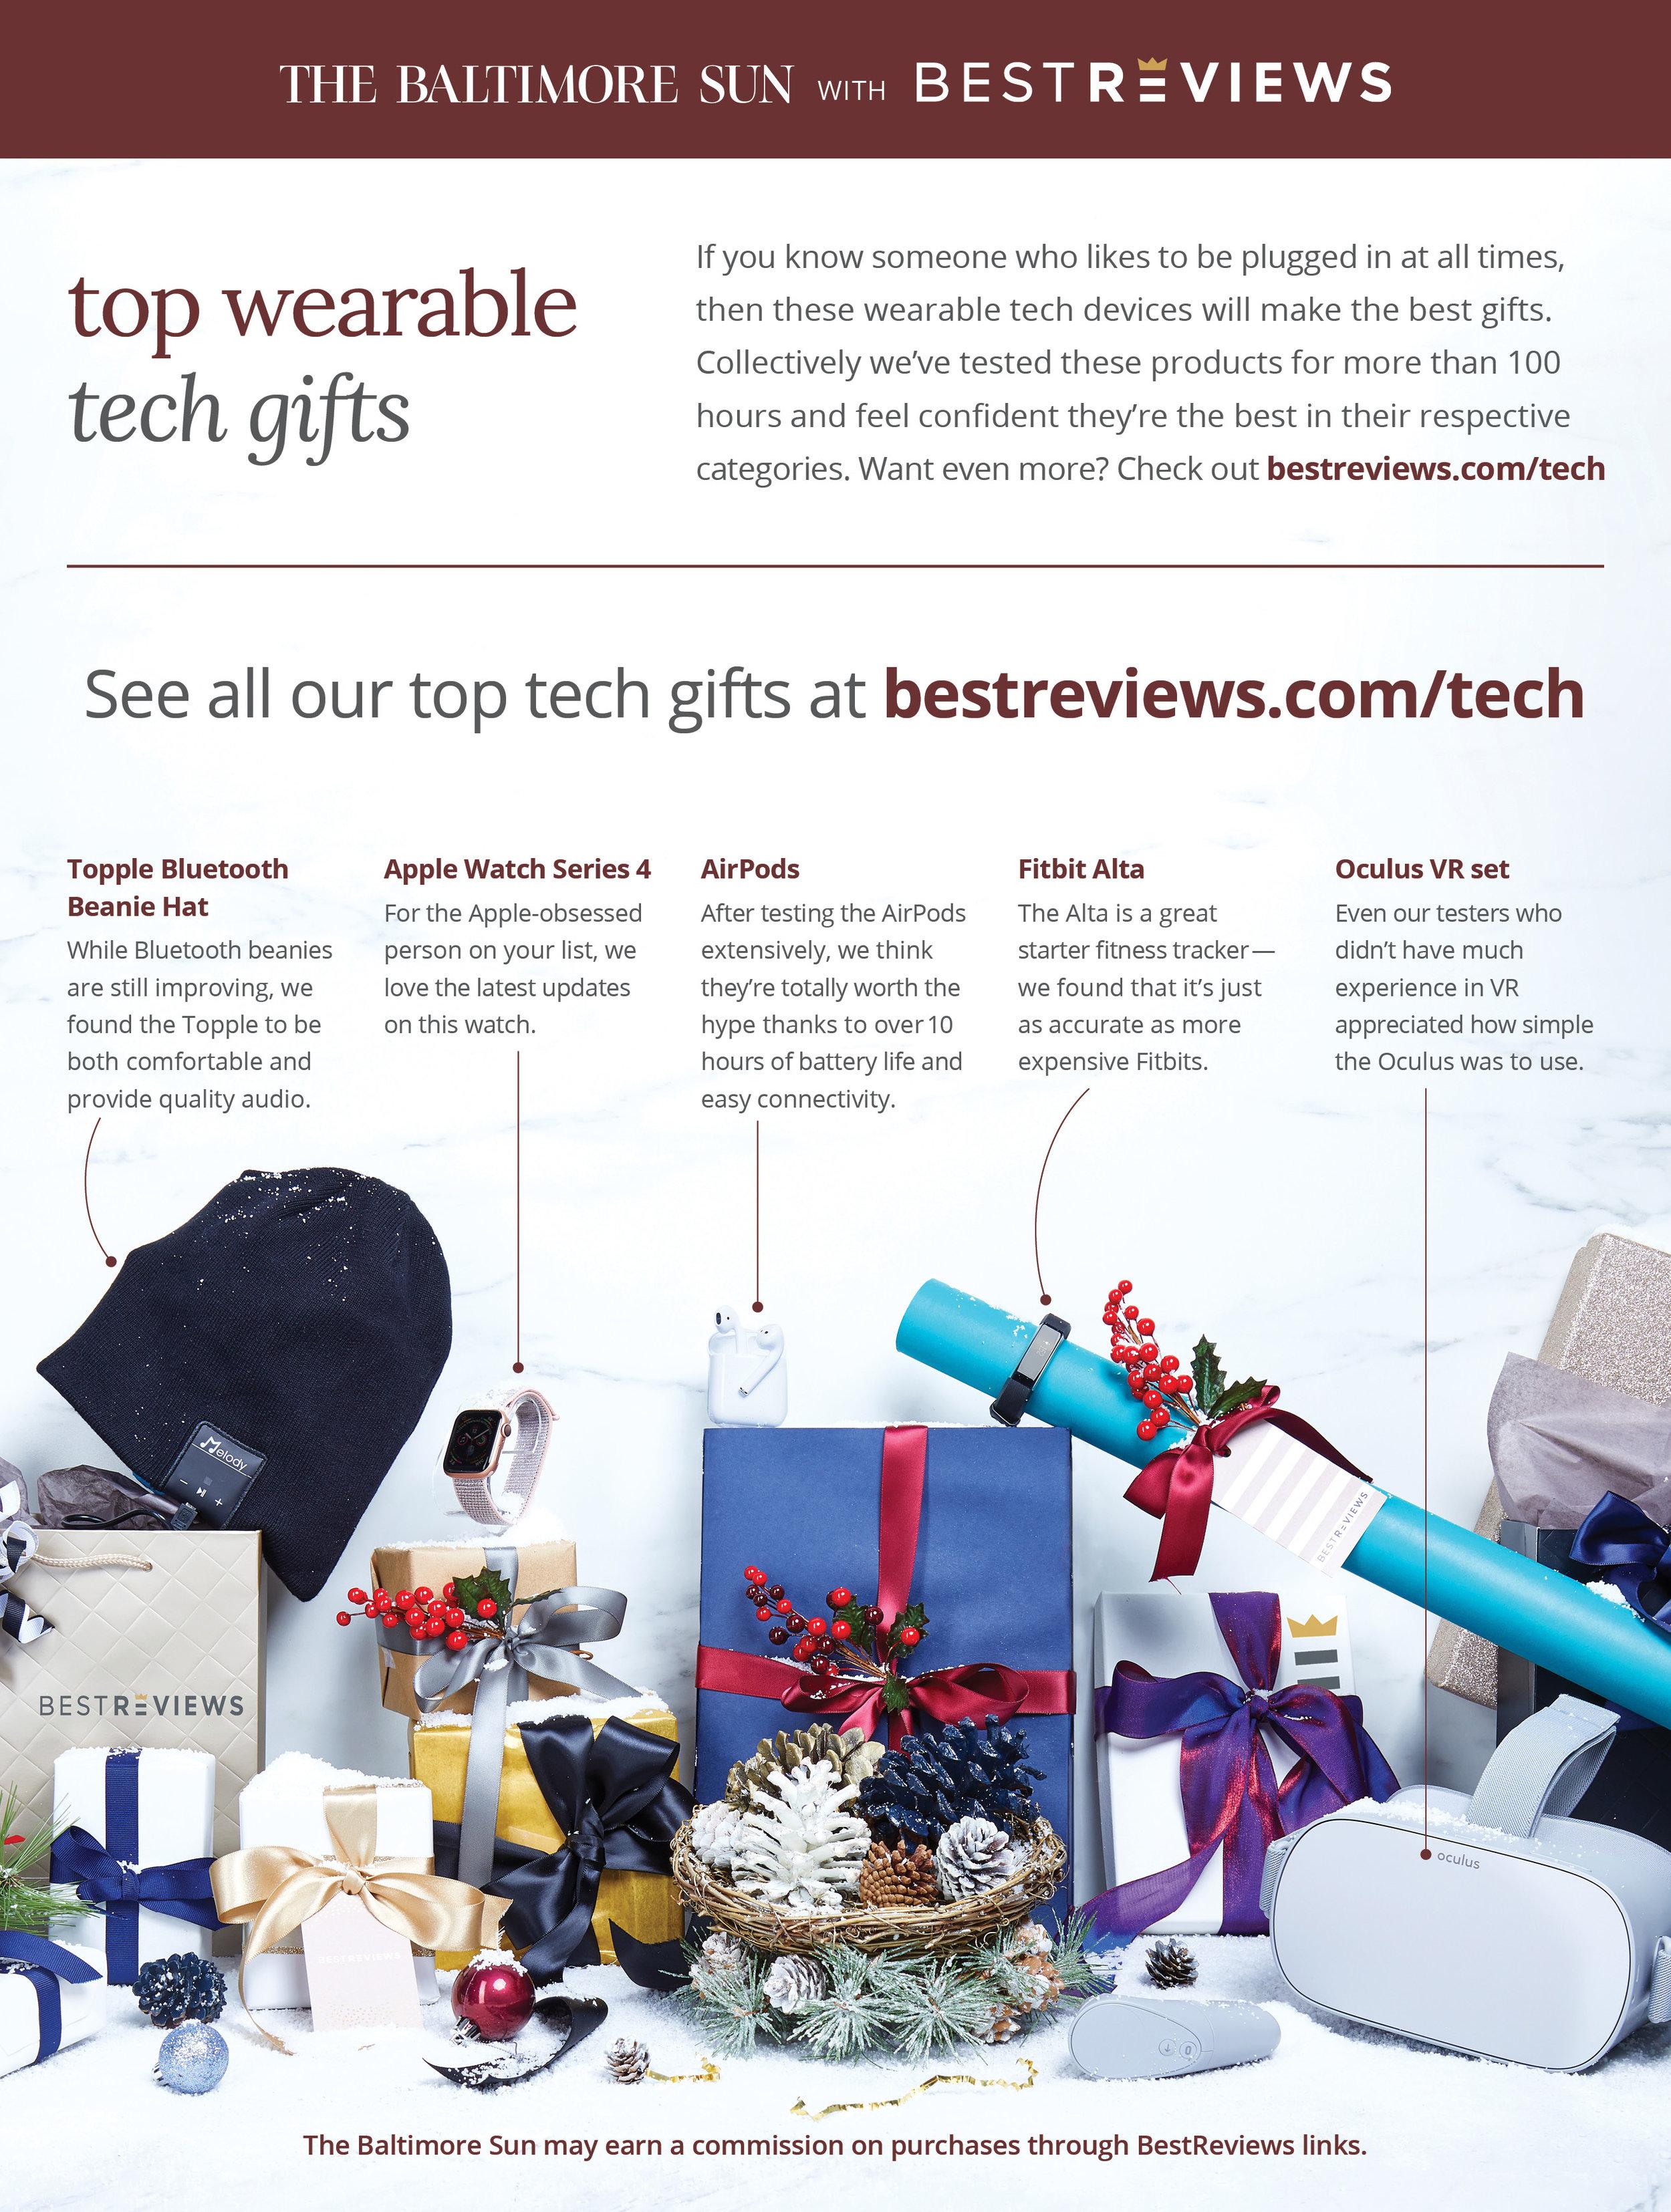 NYDN_Tech Gift Guide_Smart Home3.jpg